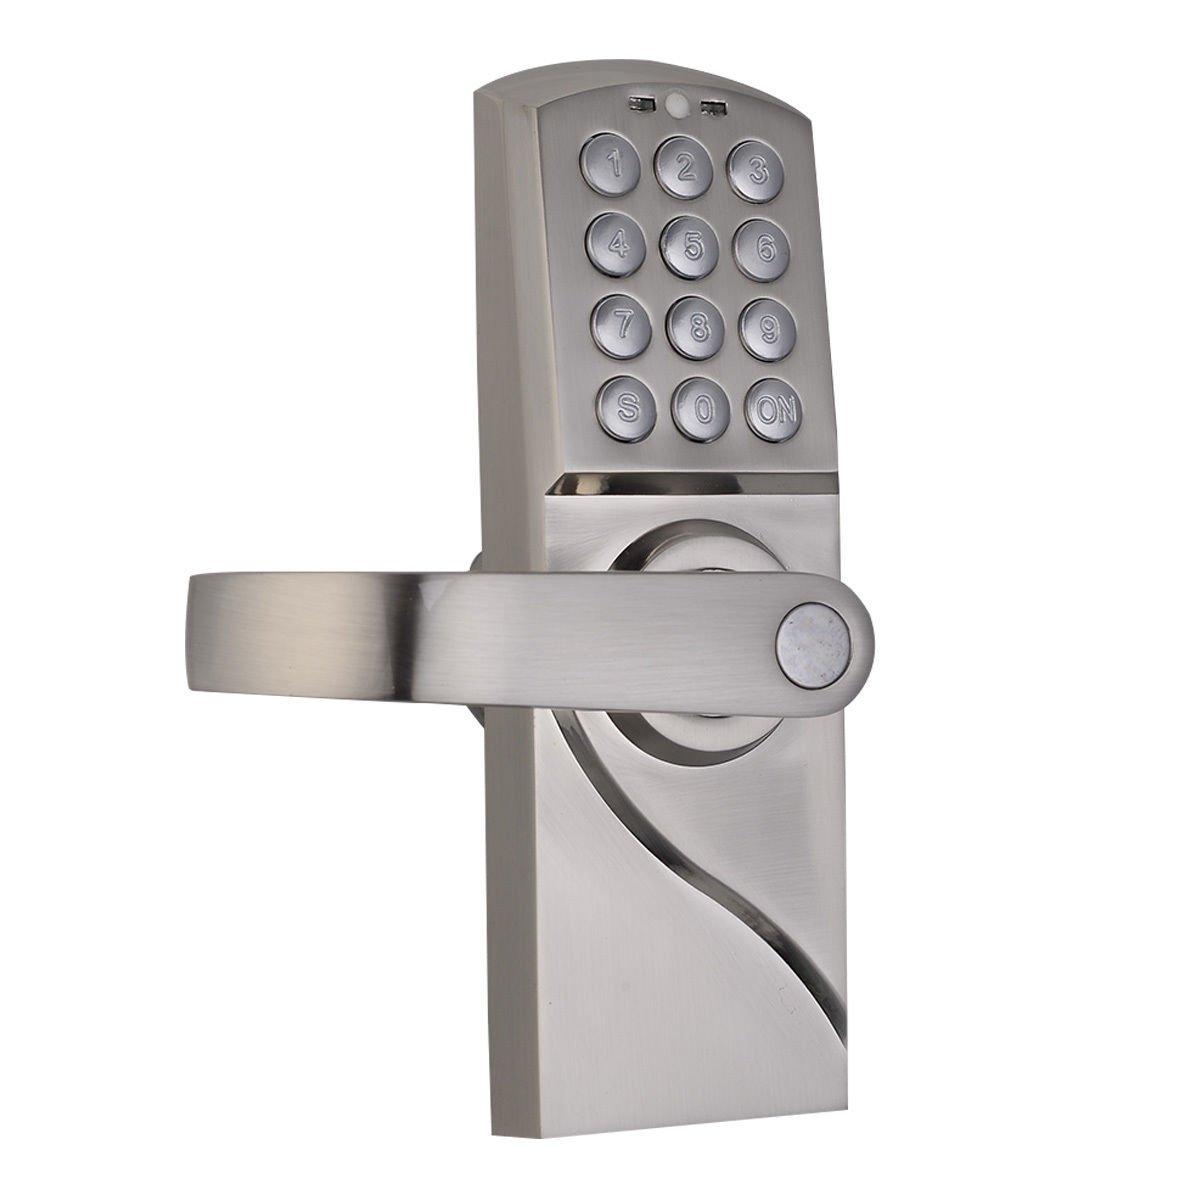 Buy Generic YCUS150720-248 dle NewKeypad Secu Security ...